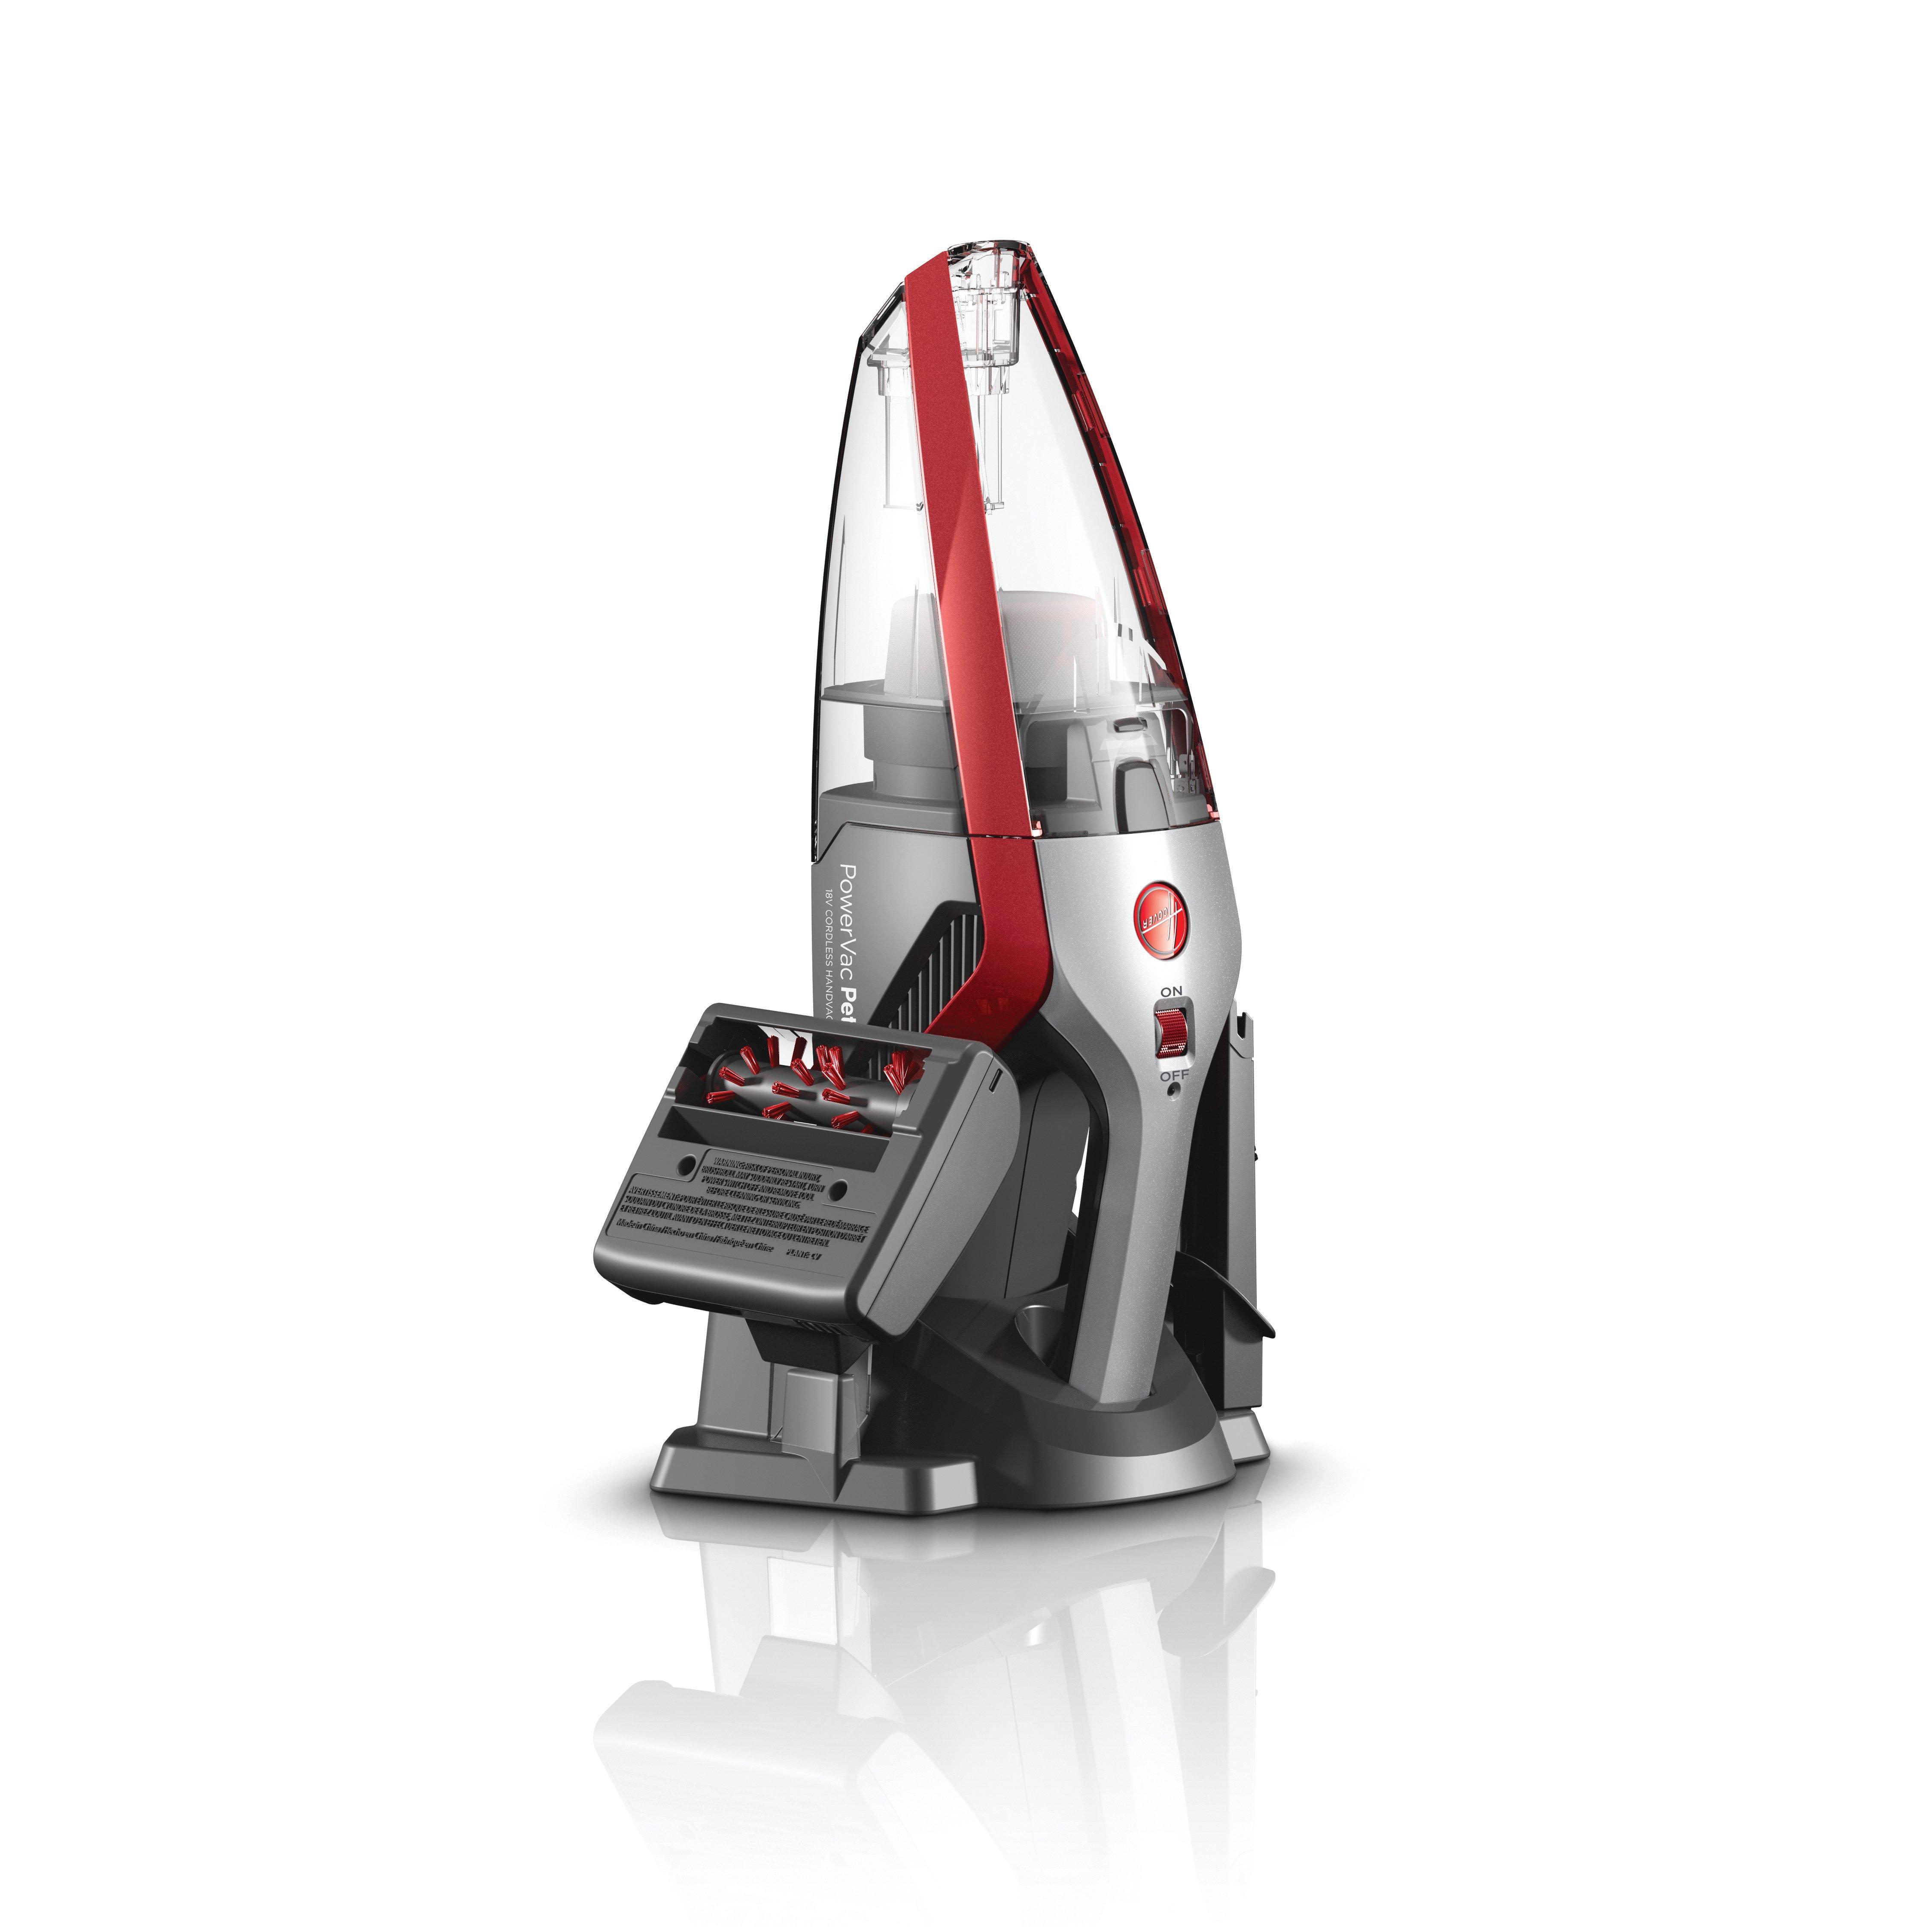 Hoover Powervac Pet 18v Cordless Handheld Vacuum Bh10100